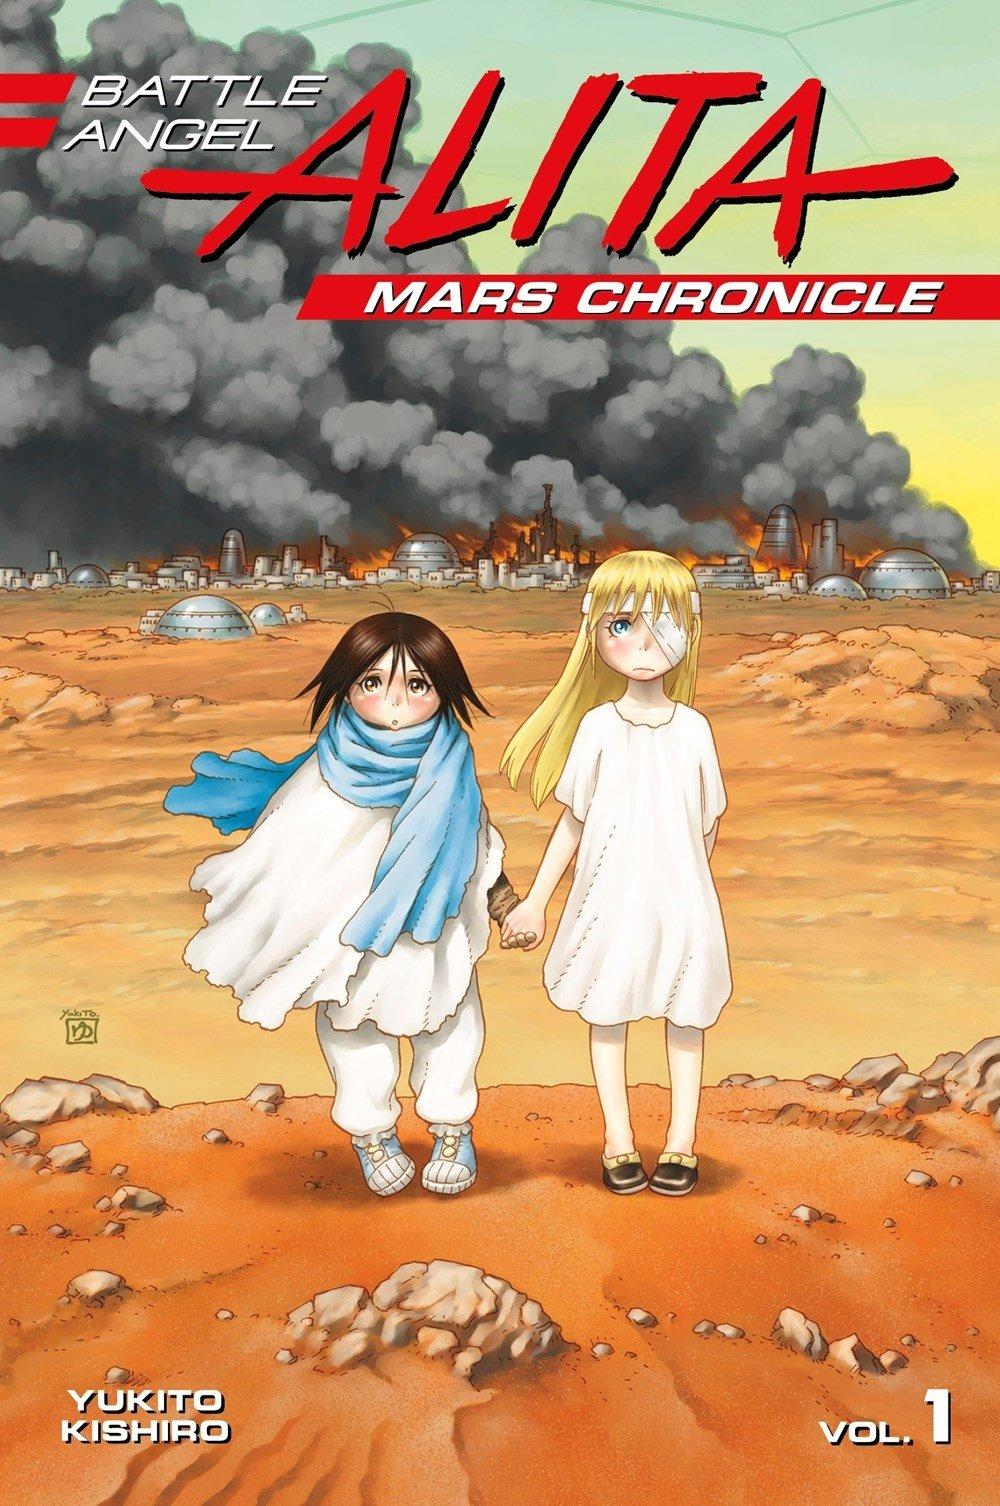 Amazon.com: Battle Angel Alita Mars Chronicle 1 (9781632366153): Kishiro, Yukito: Books